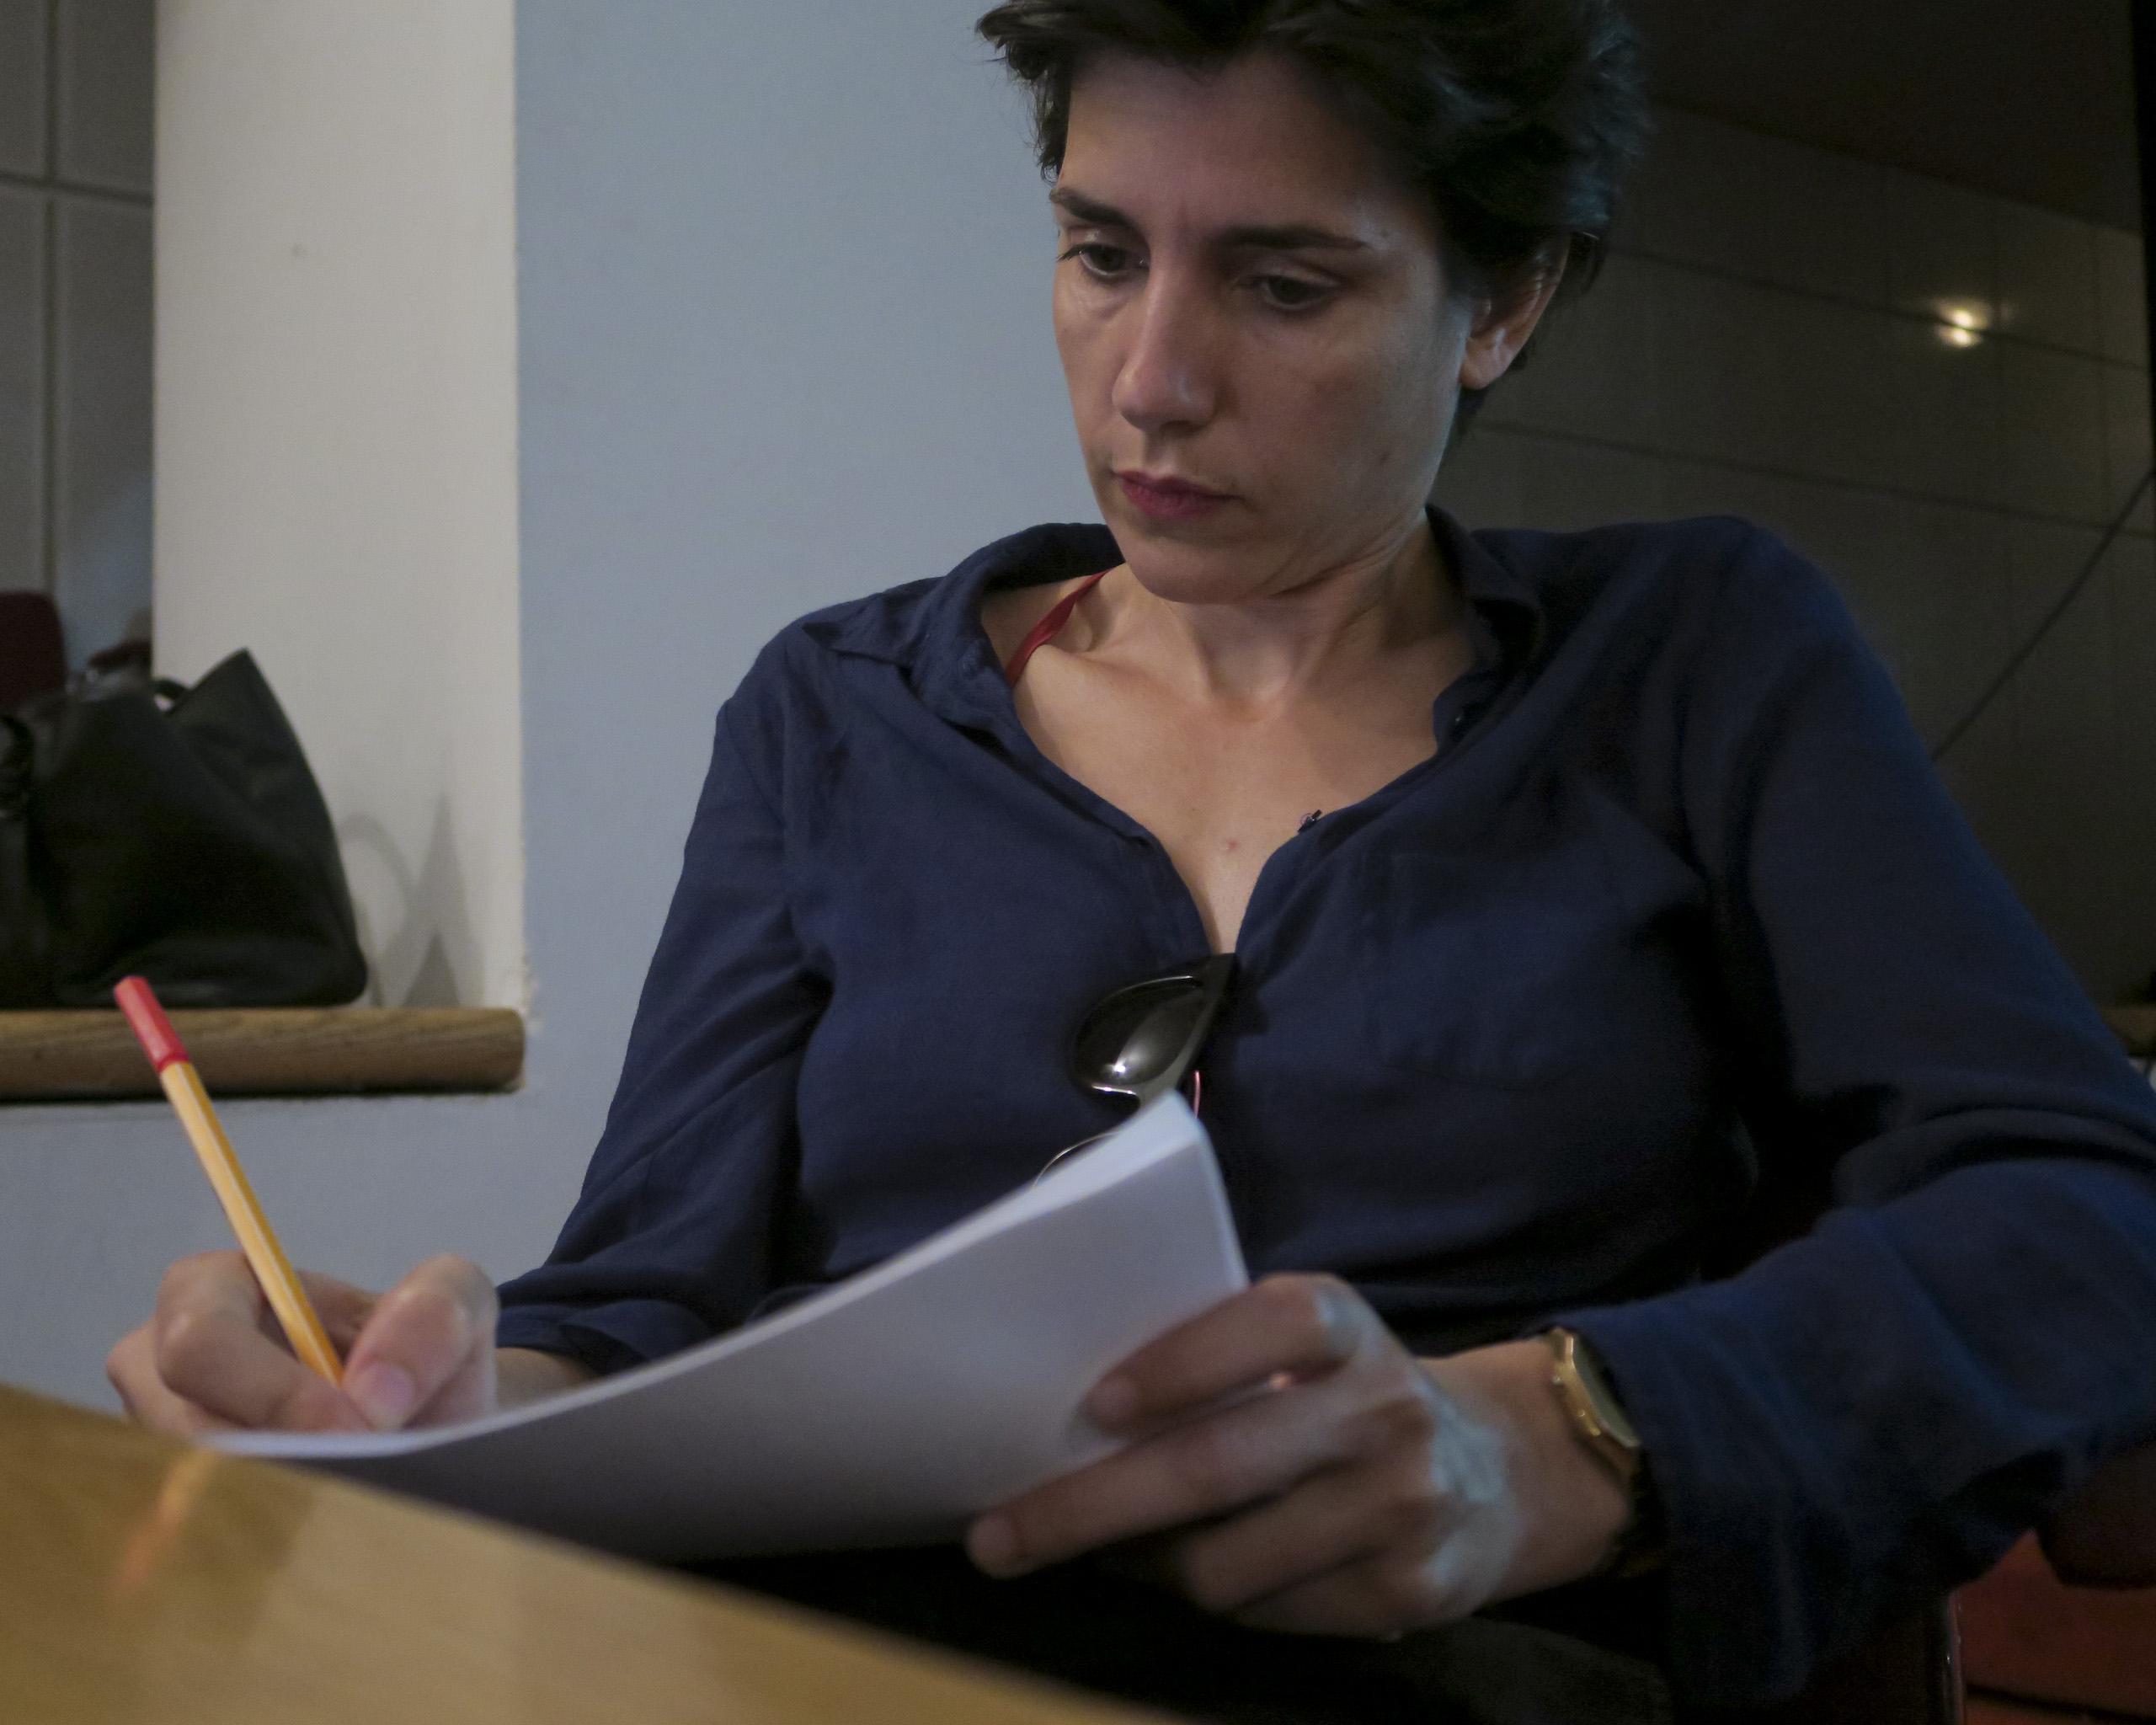 Image of Filipa César from Wikidata